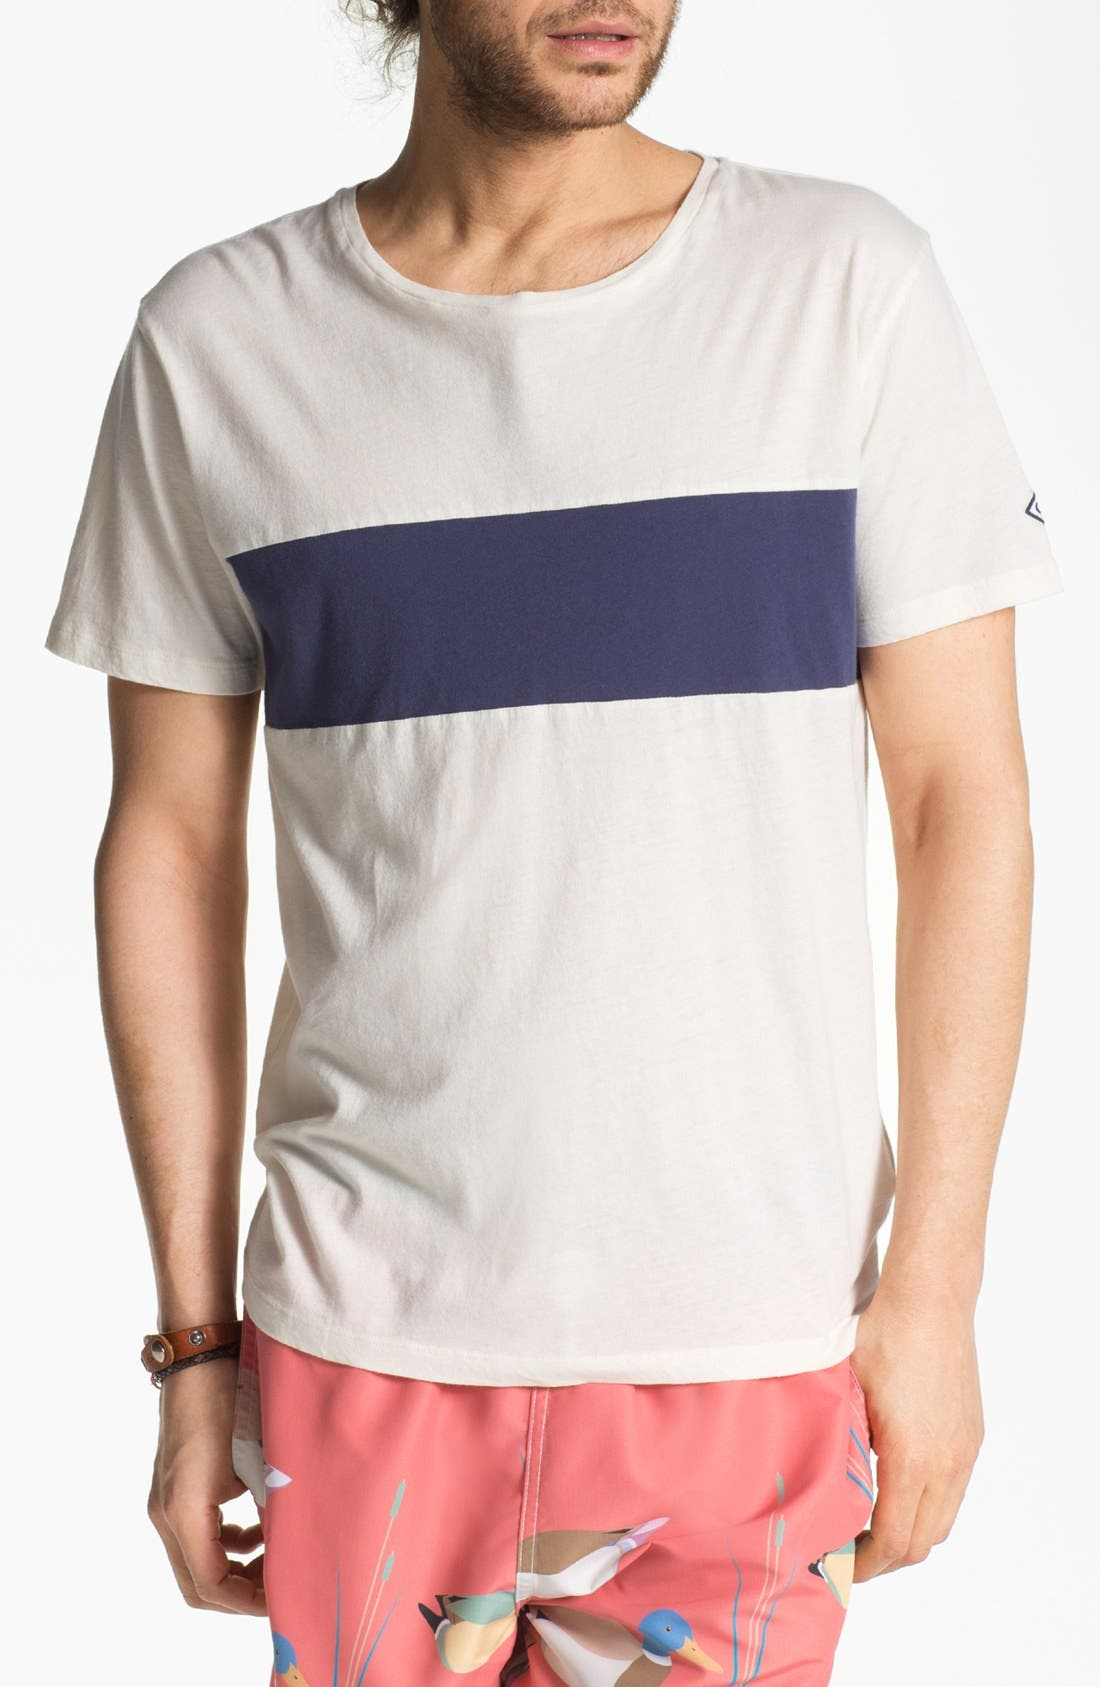 Main Image - Gant Rugger 'Cut & Sewn' T-Shirt